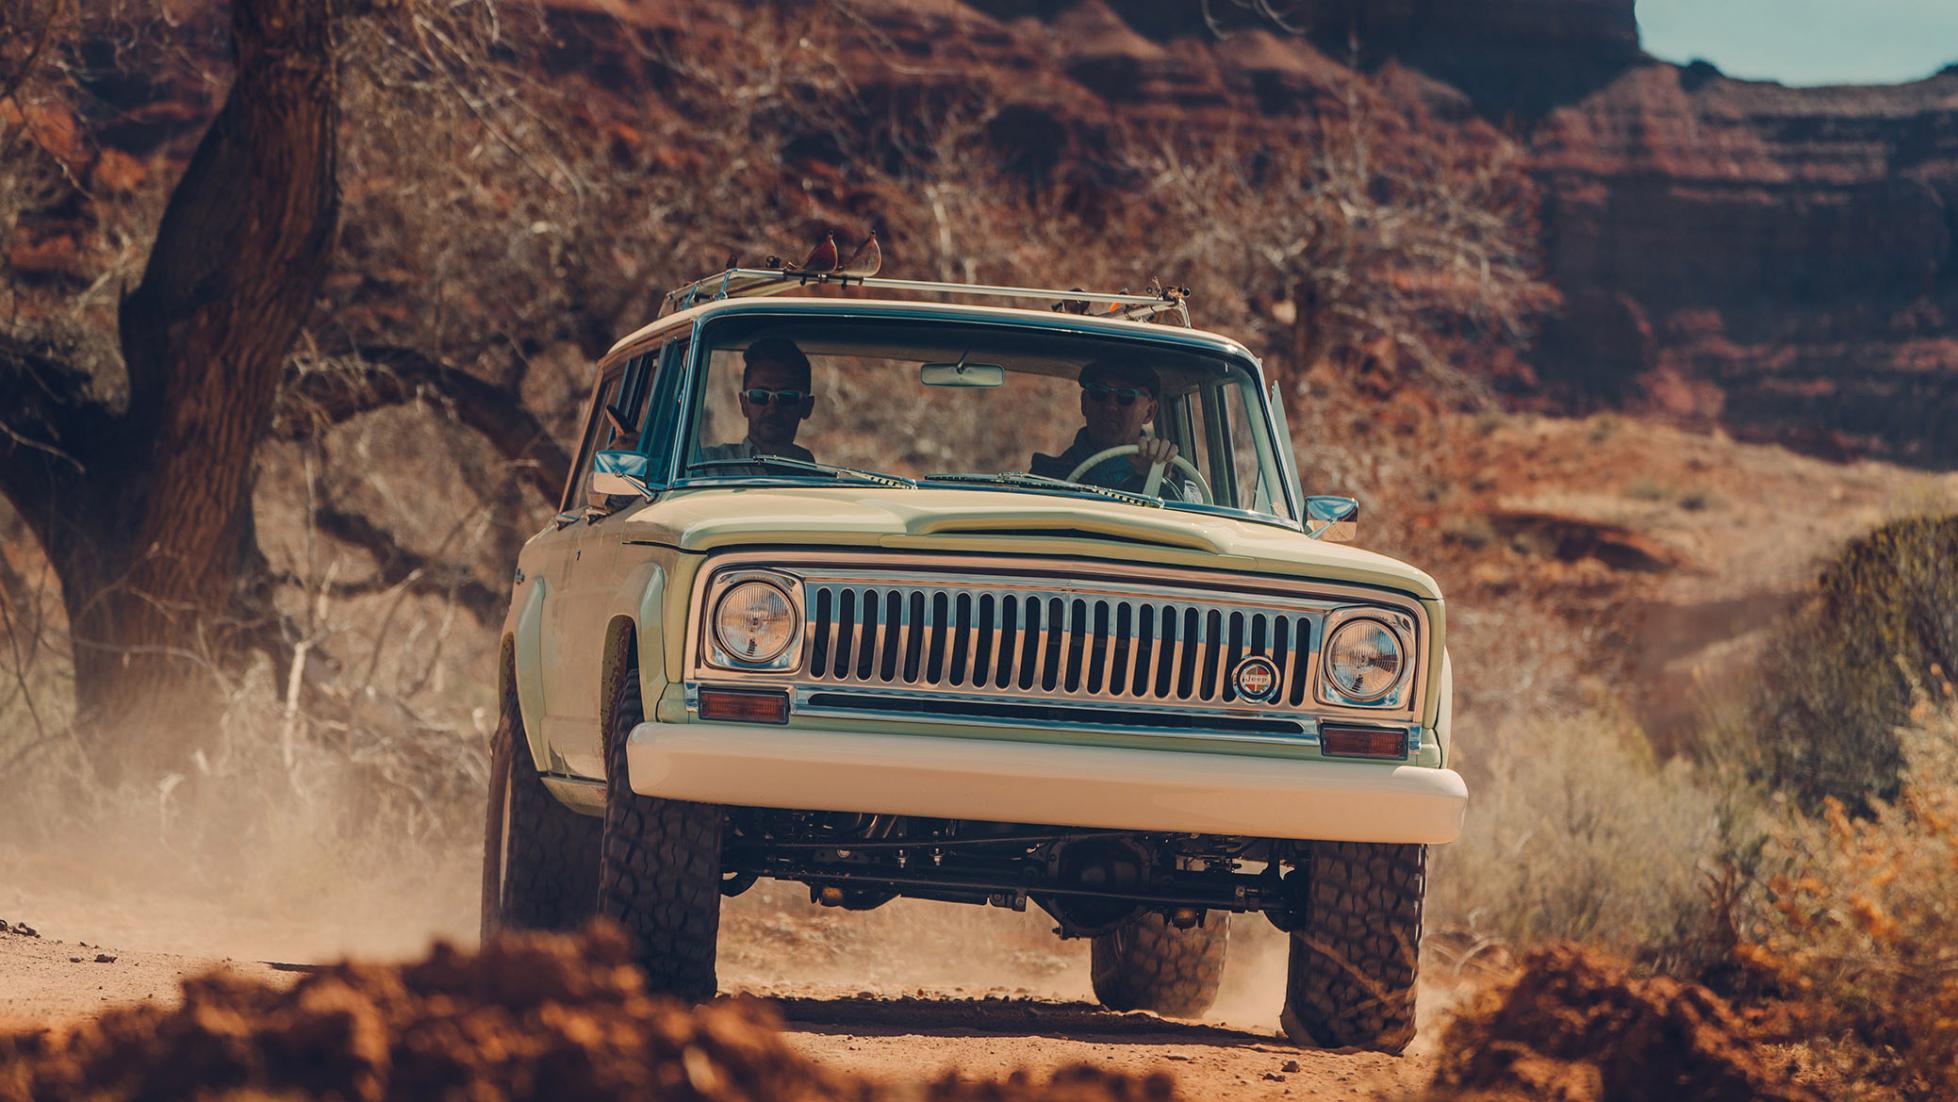 Jeep Wagoneer Roadtrip Concept